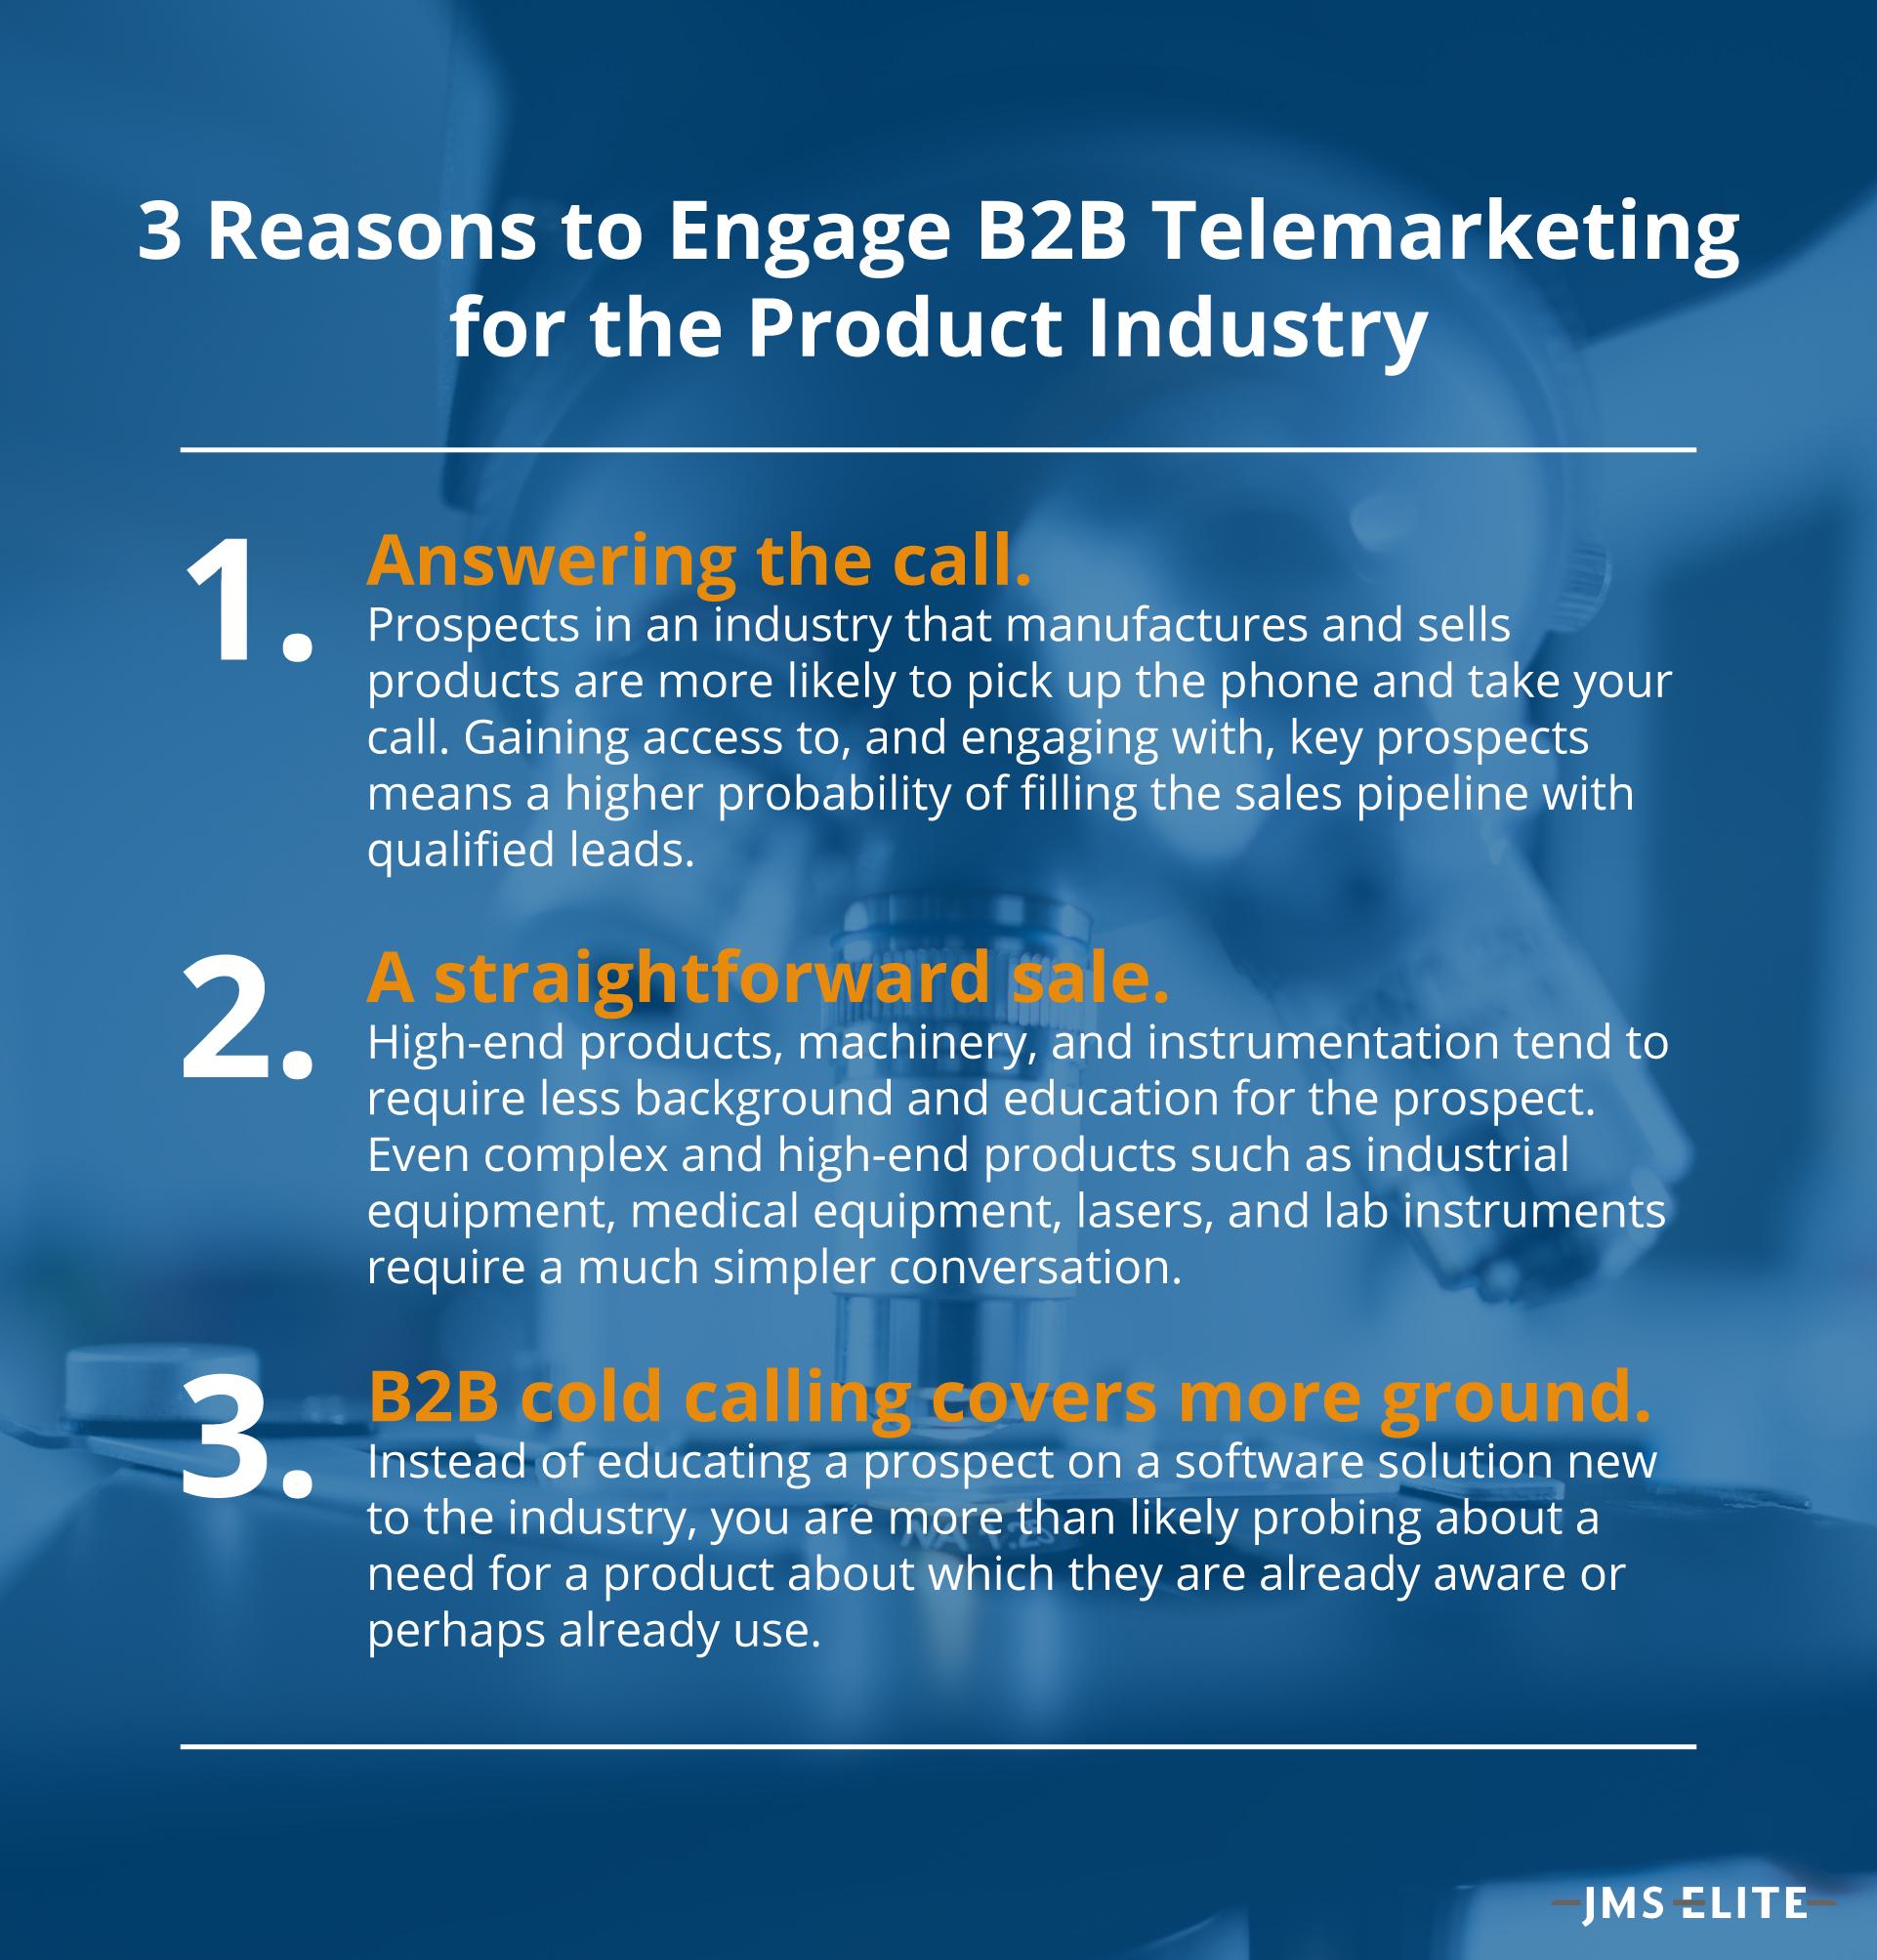 3 Reasons to Engage B2B Telemarketing